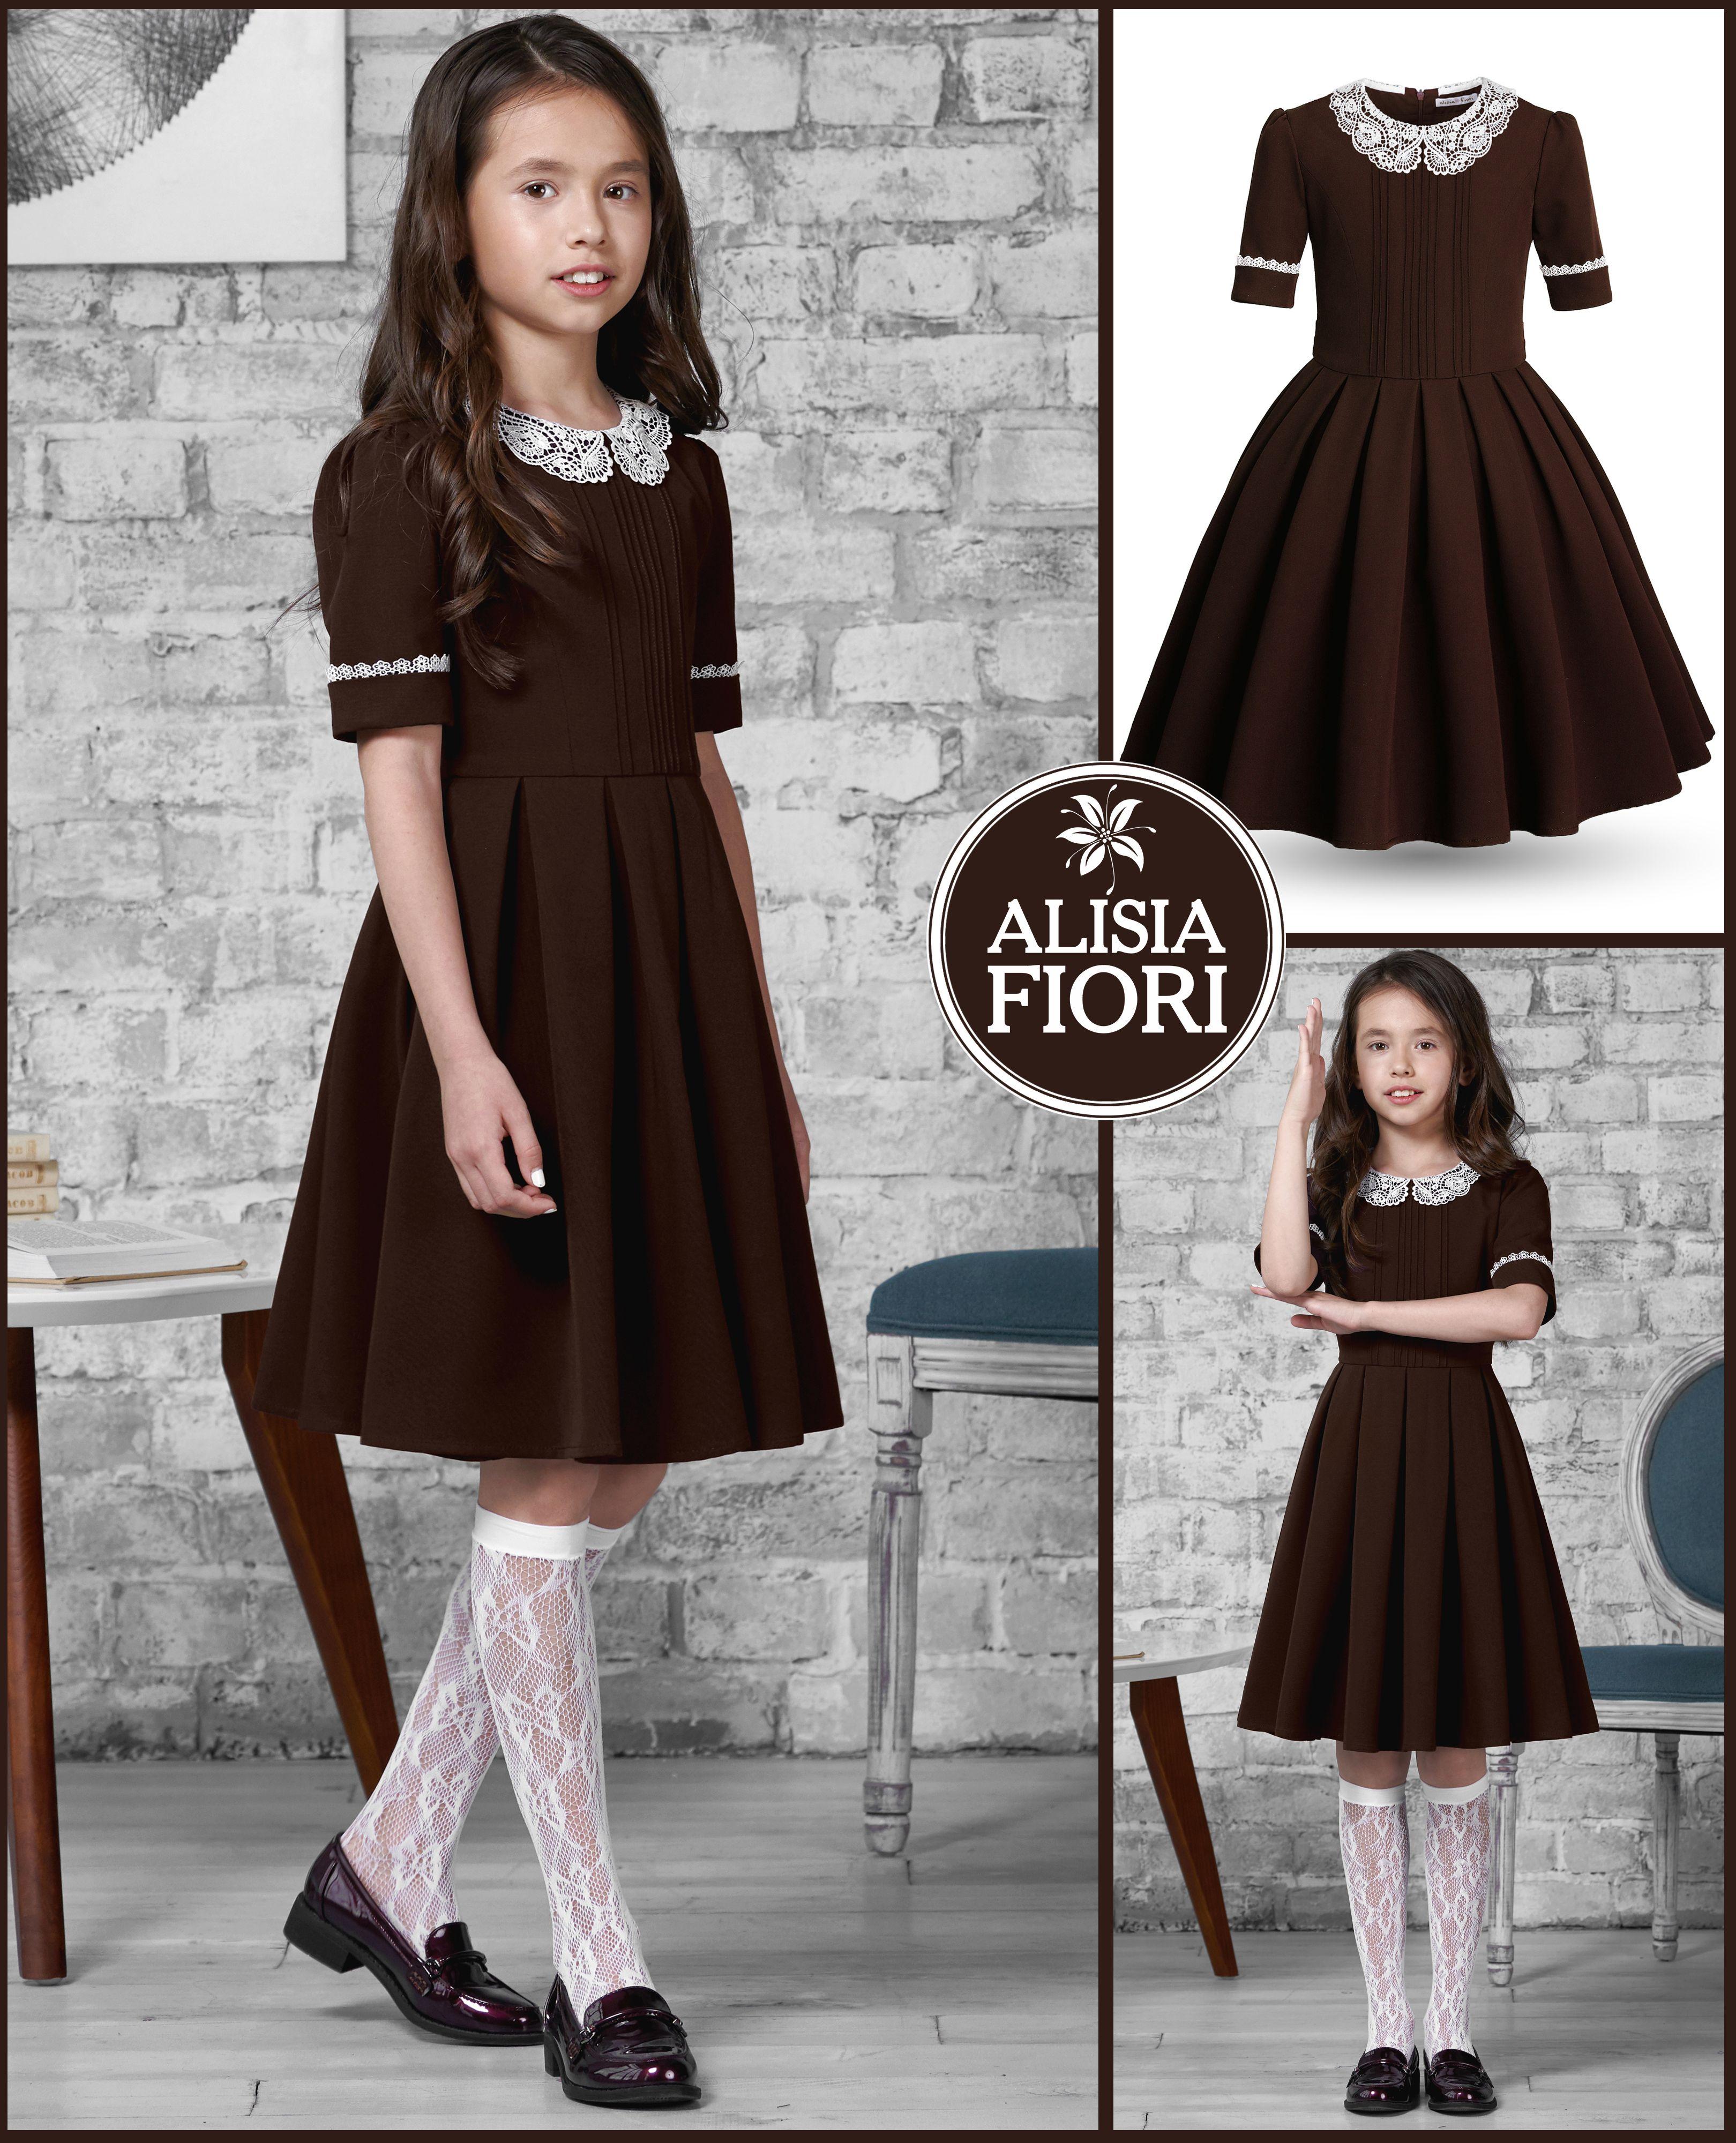 alisia fiori   dresses for teens, dresses, girl fashion